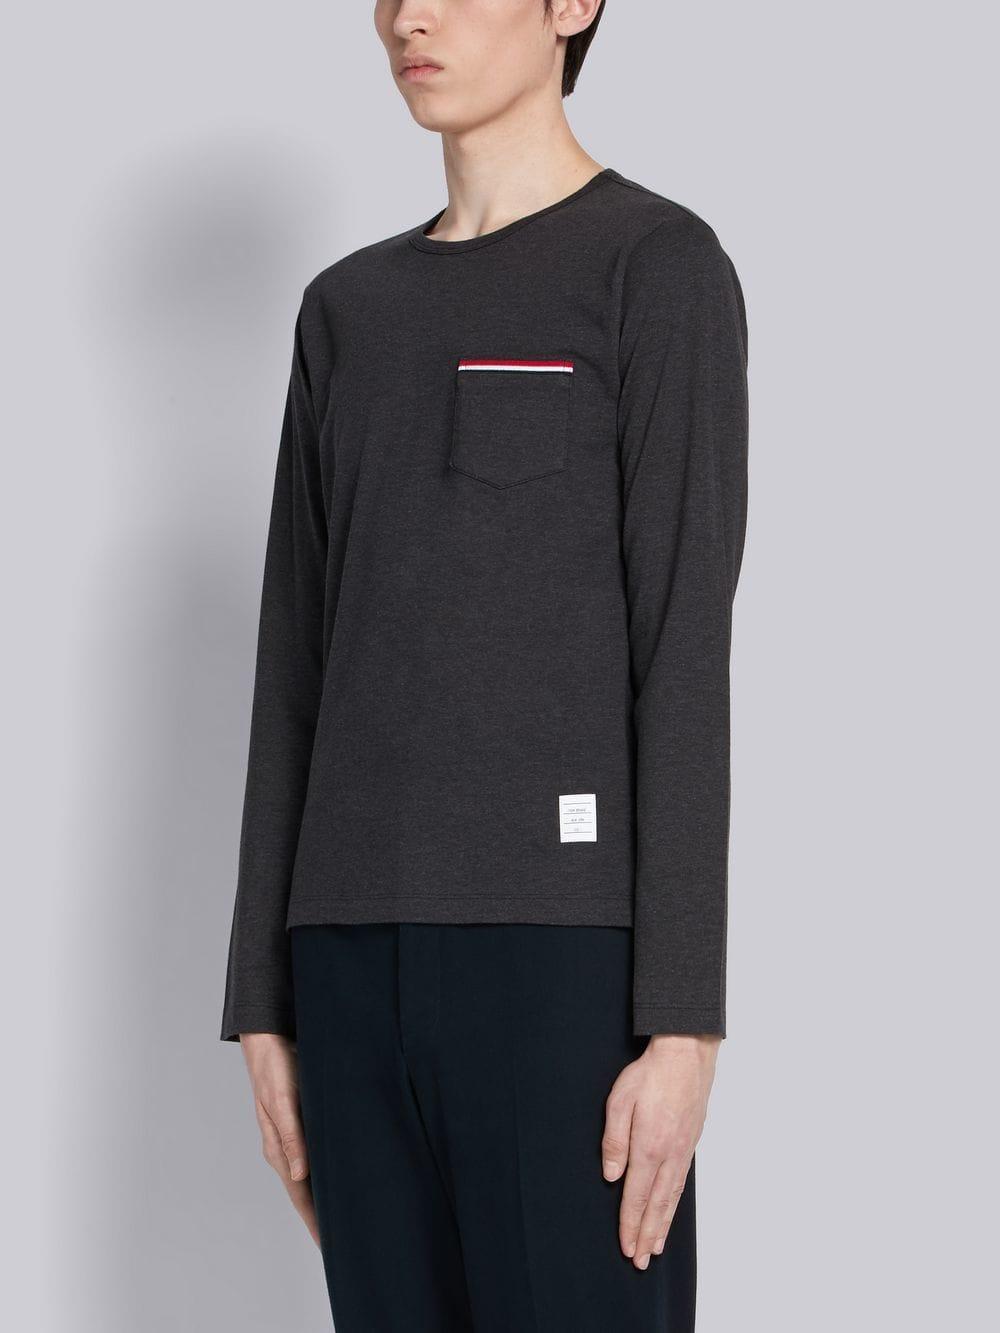 085e7081dad Thom Browne Rwb Pocket Trim Long-sleeve Tee in Gray for Men - Lyst